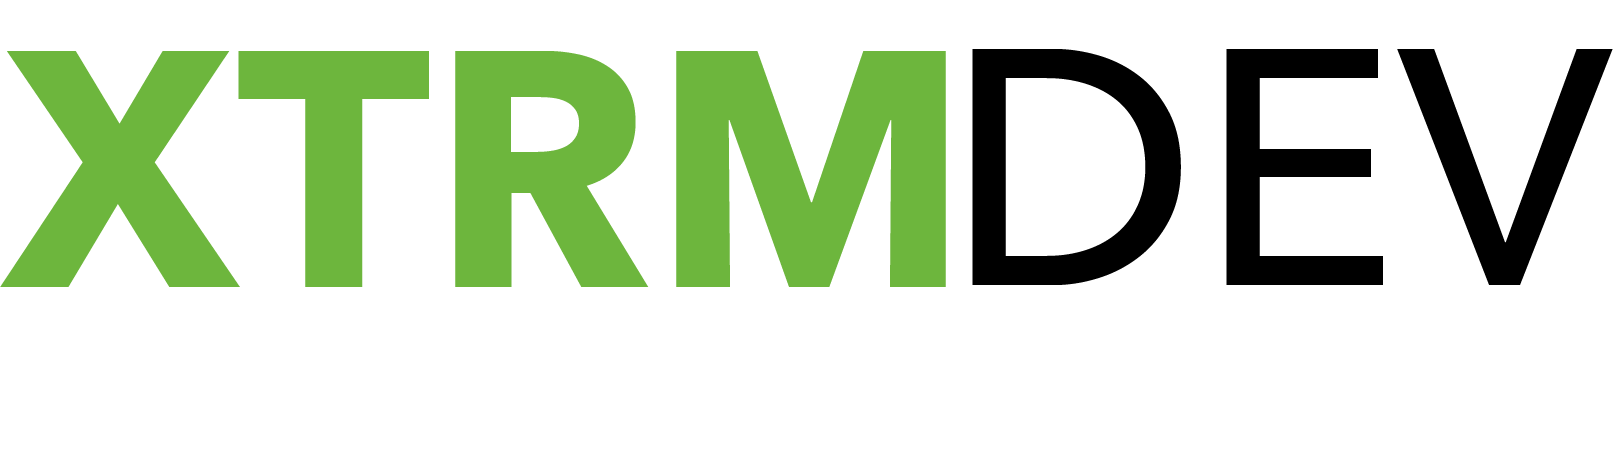 logo partners xtrm development